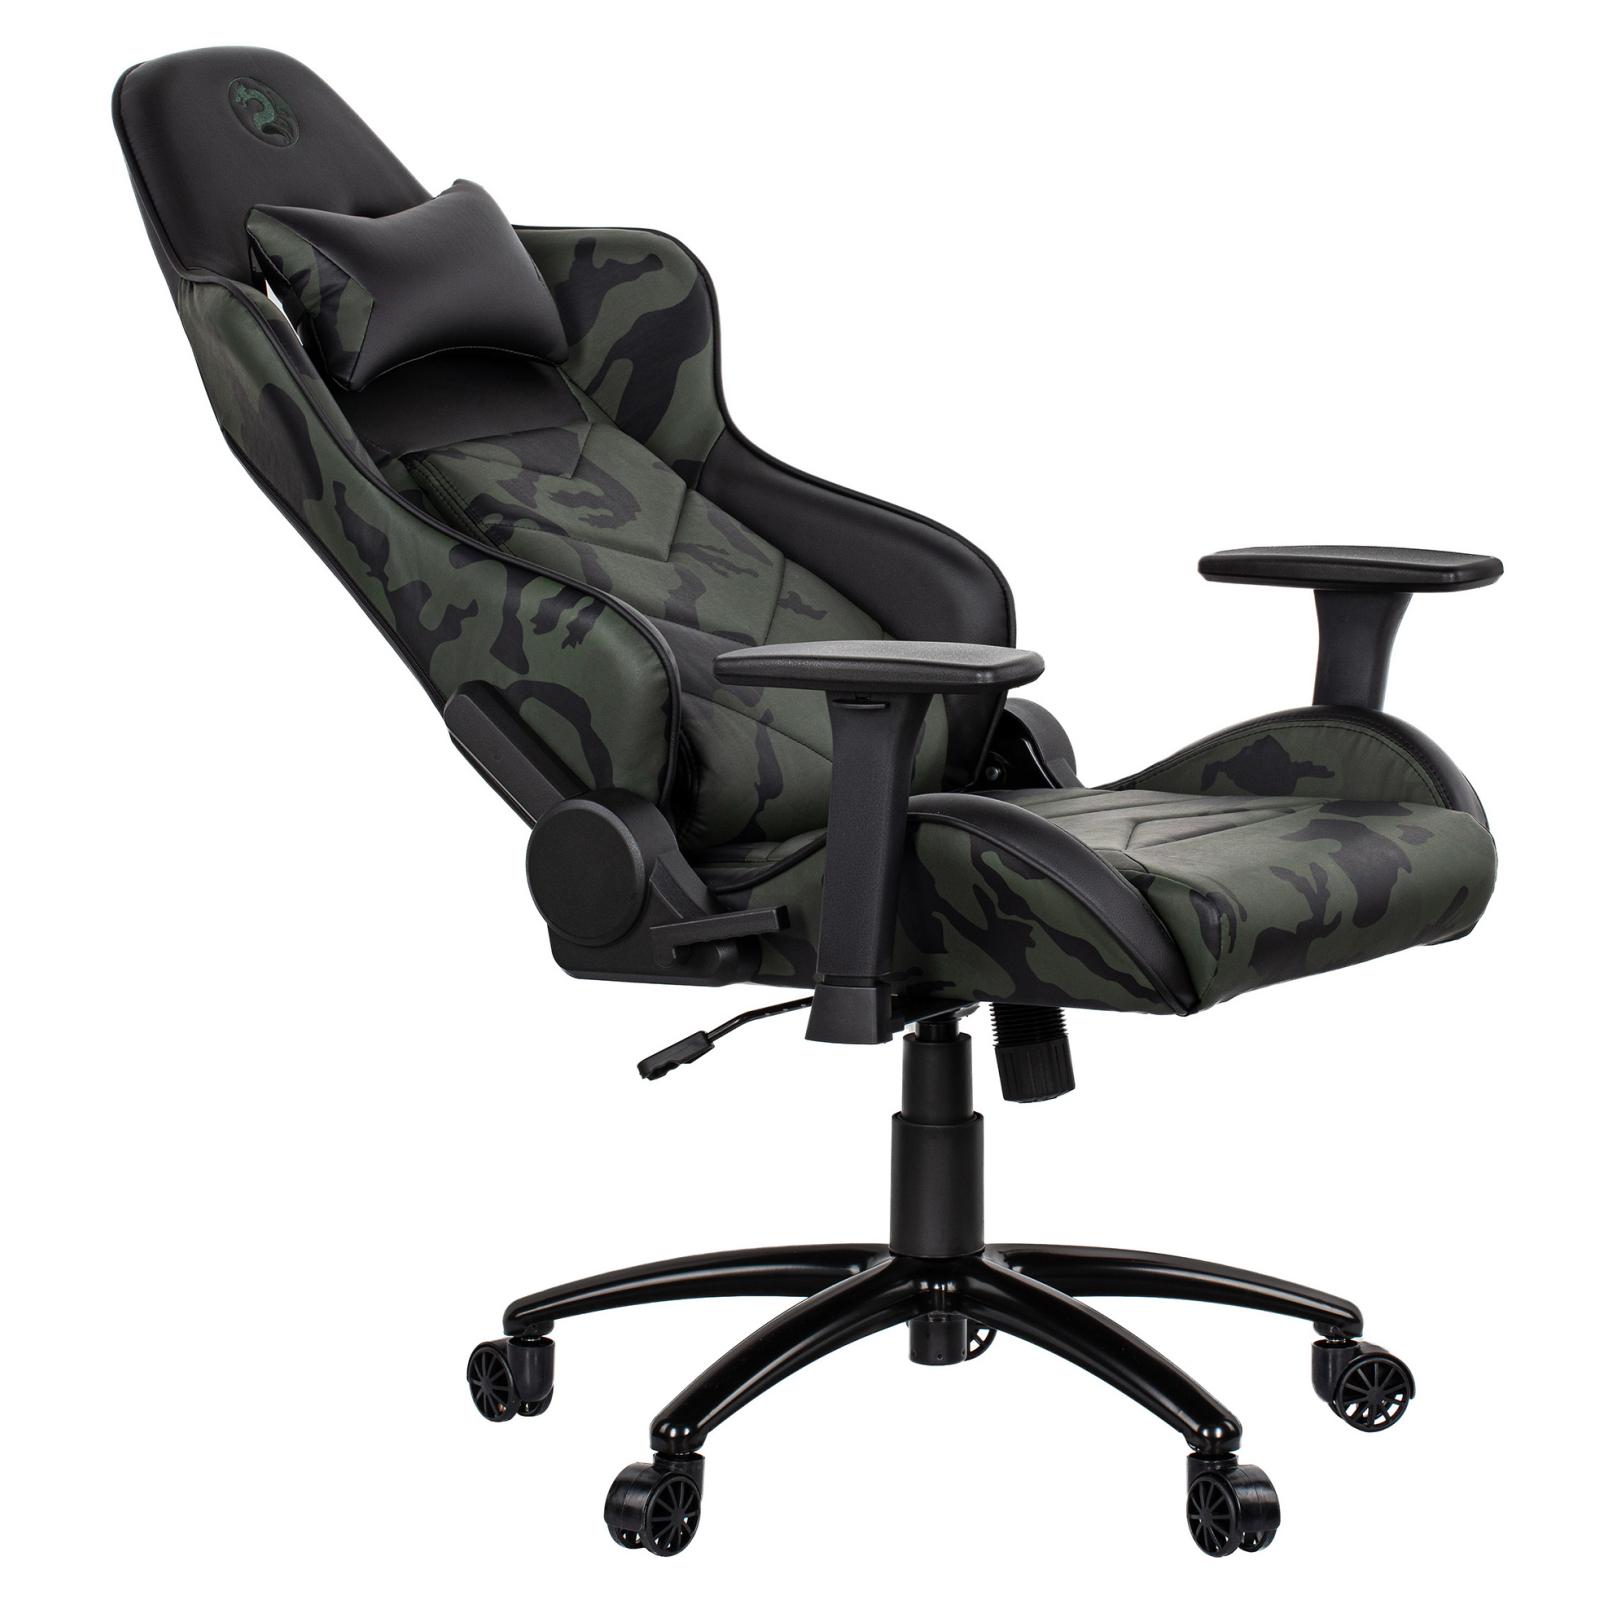 Крісло ігрове 2E GC22 Camouflage (2E-GC22CAM) зображення 4